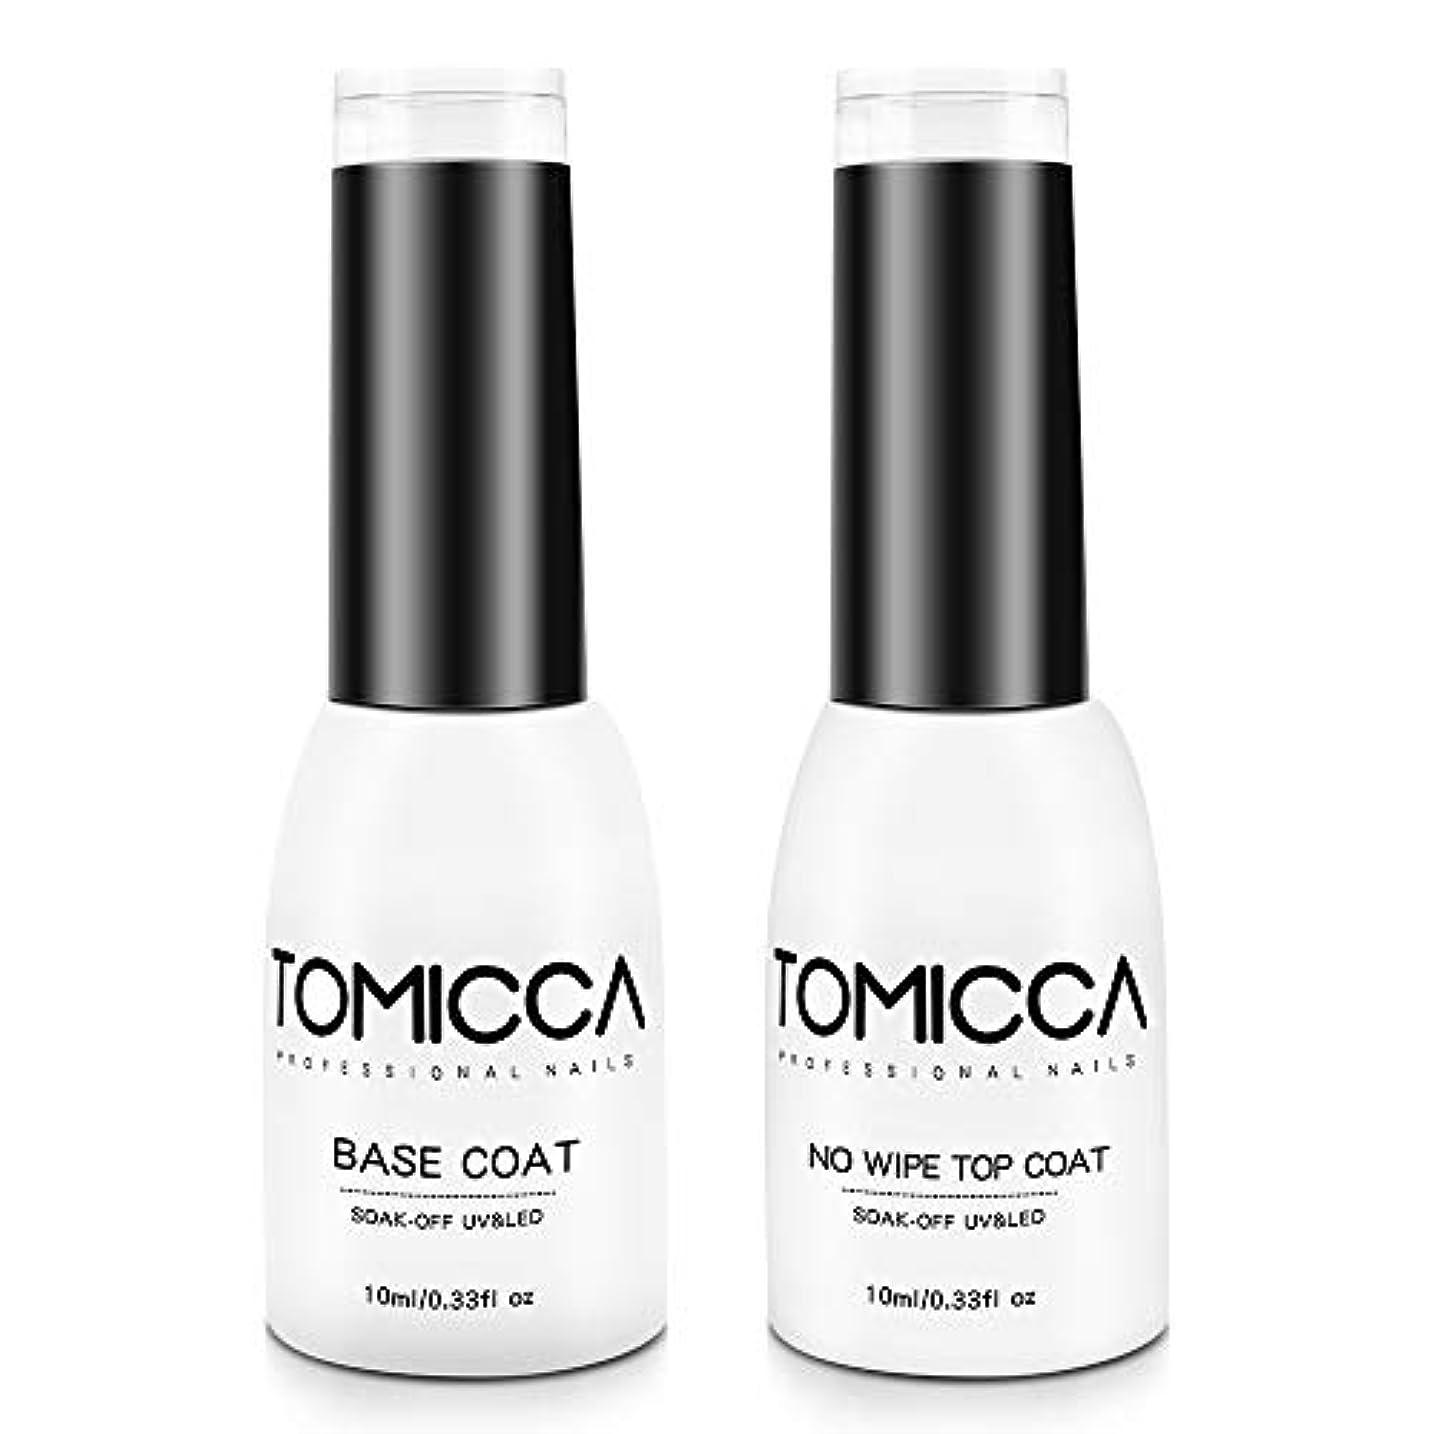 TOMICCA ジェルネイル ベースコート トップコート 10ml 2本セット 拭き取り不要 UV/LED対応 大容量 (ベース&トップコート)